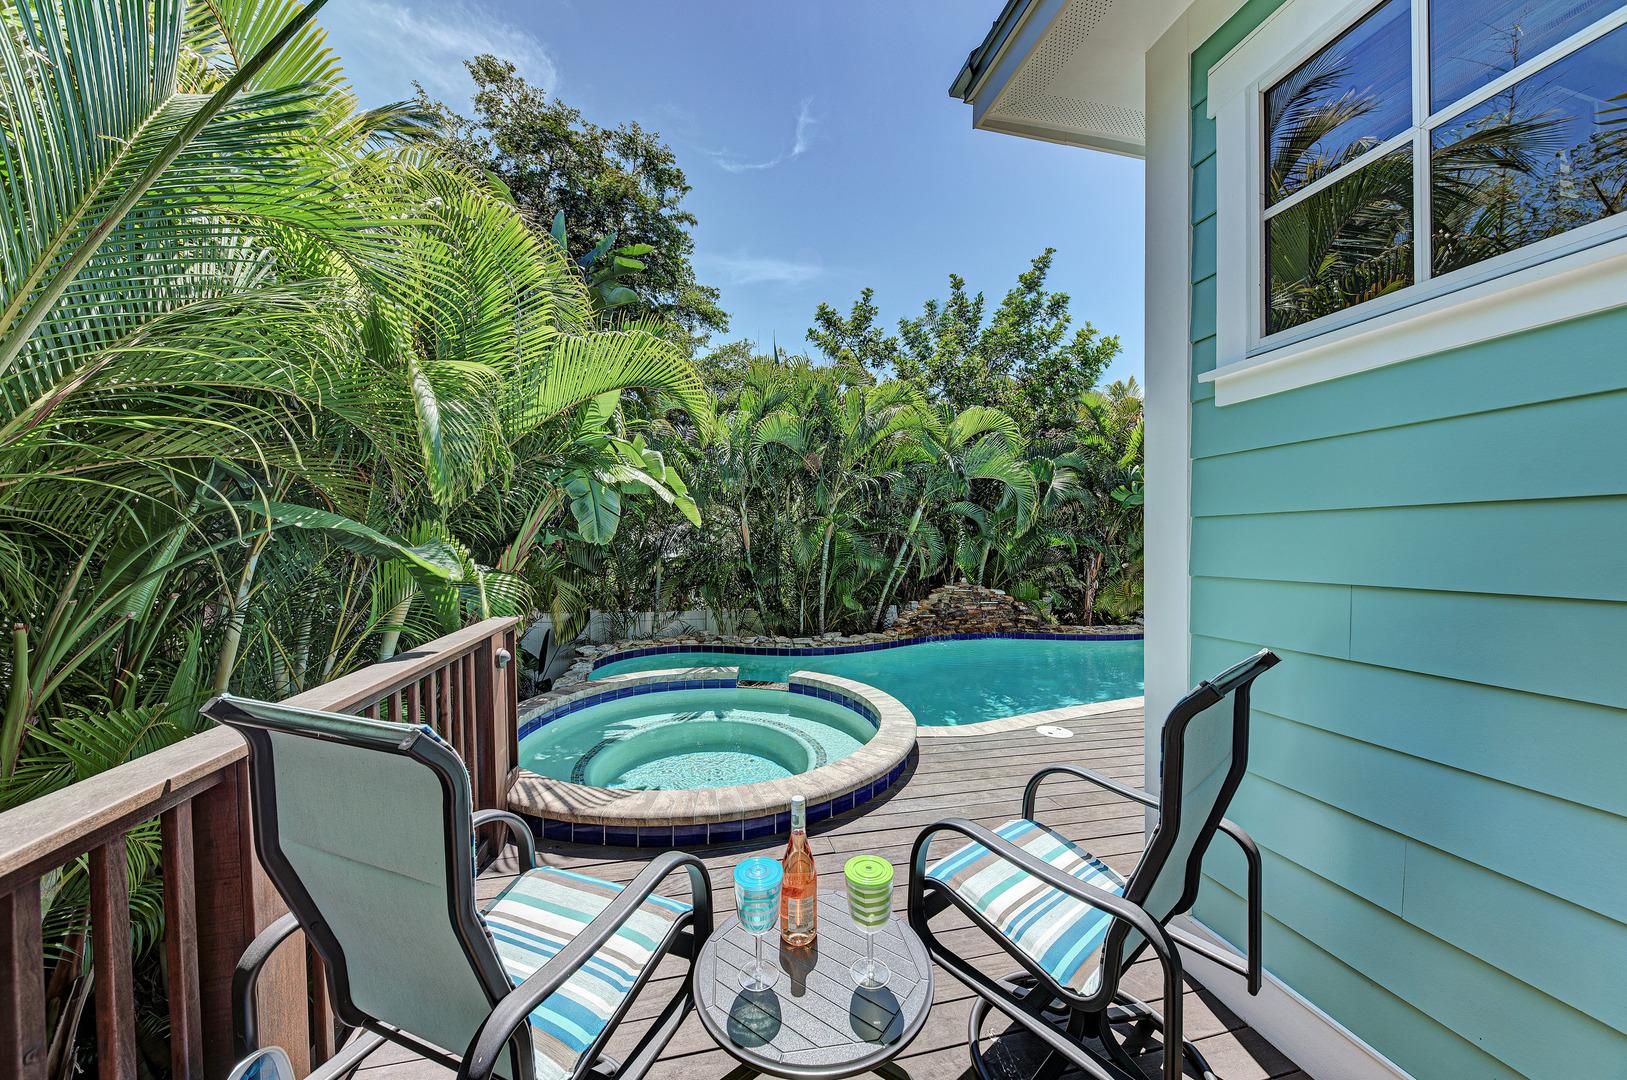 Blue Palm Paradise spa